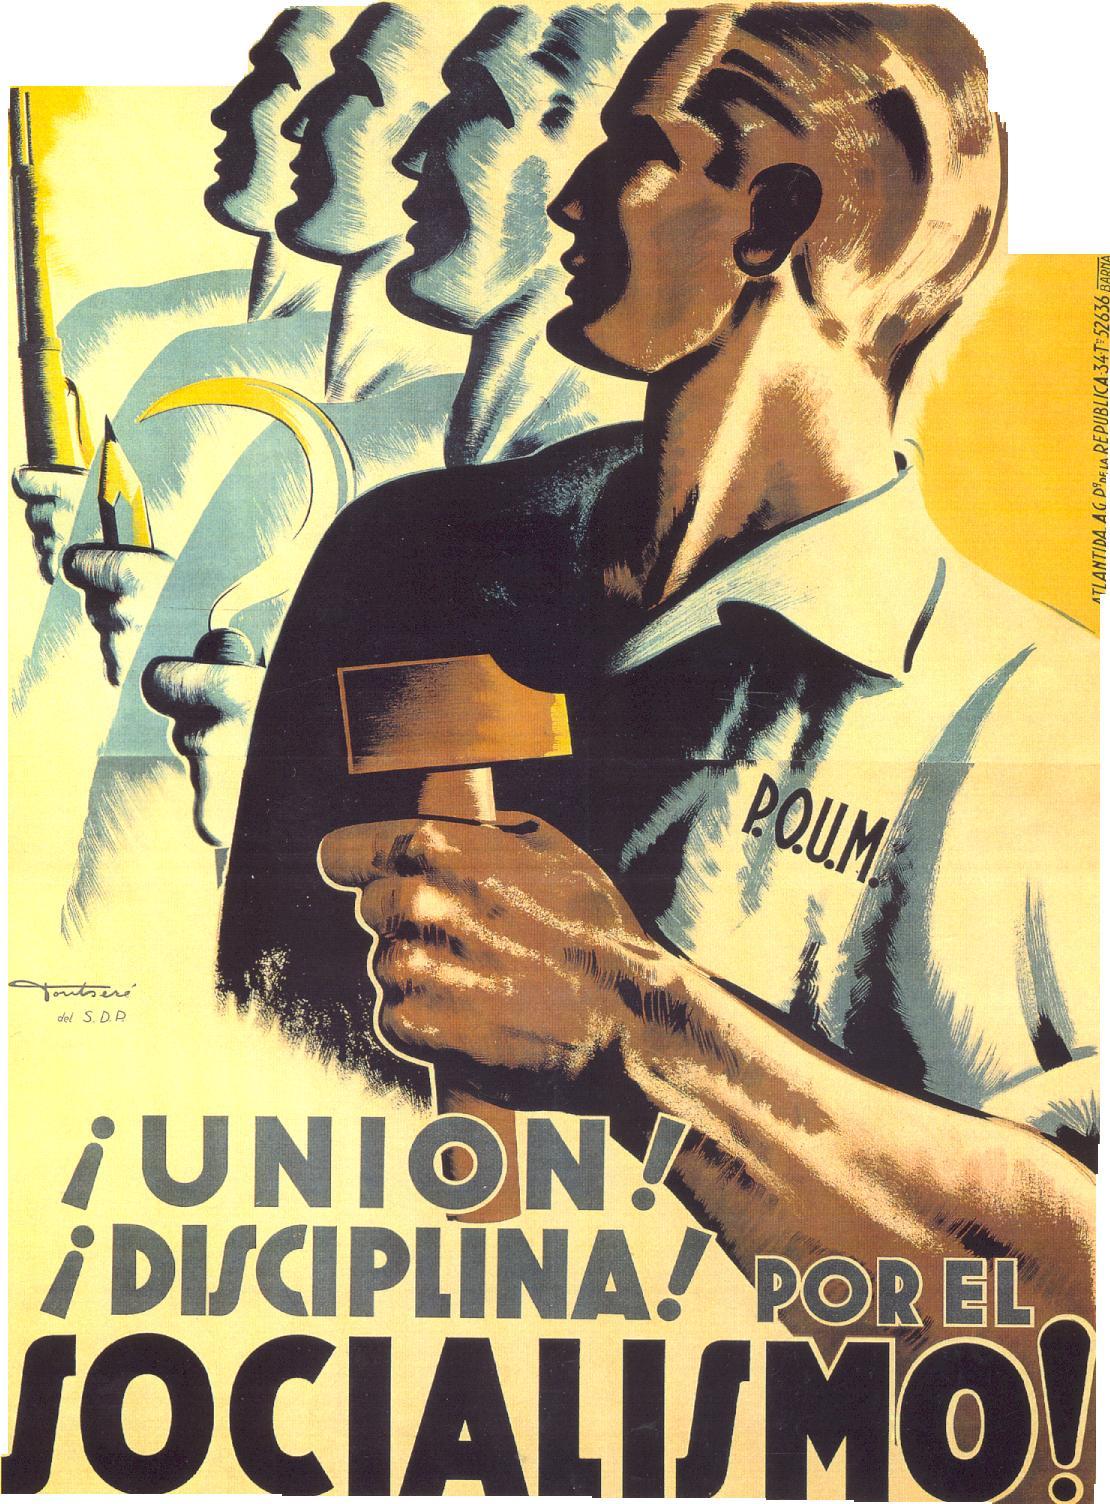 Sticker risitas socialisme communisme discipline staline revolution propagande gauche